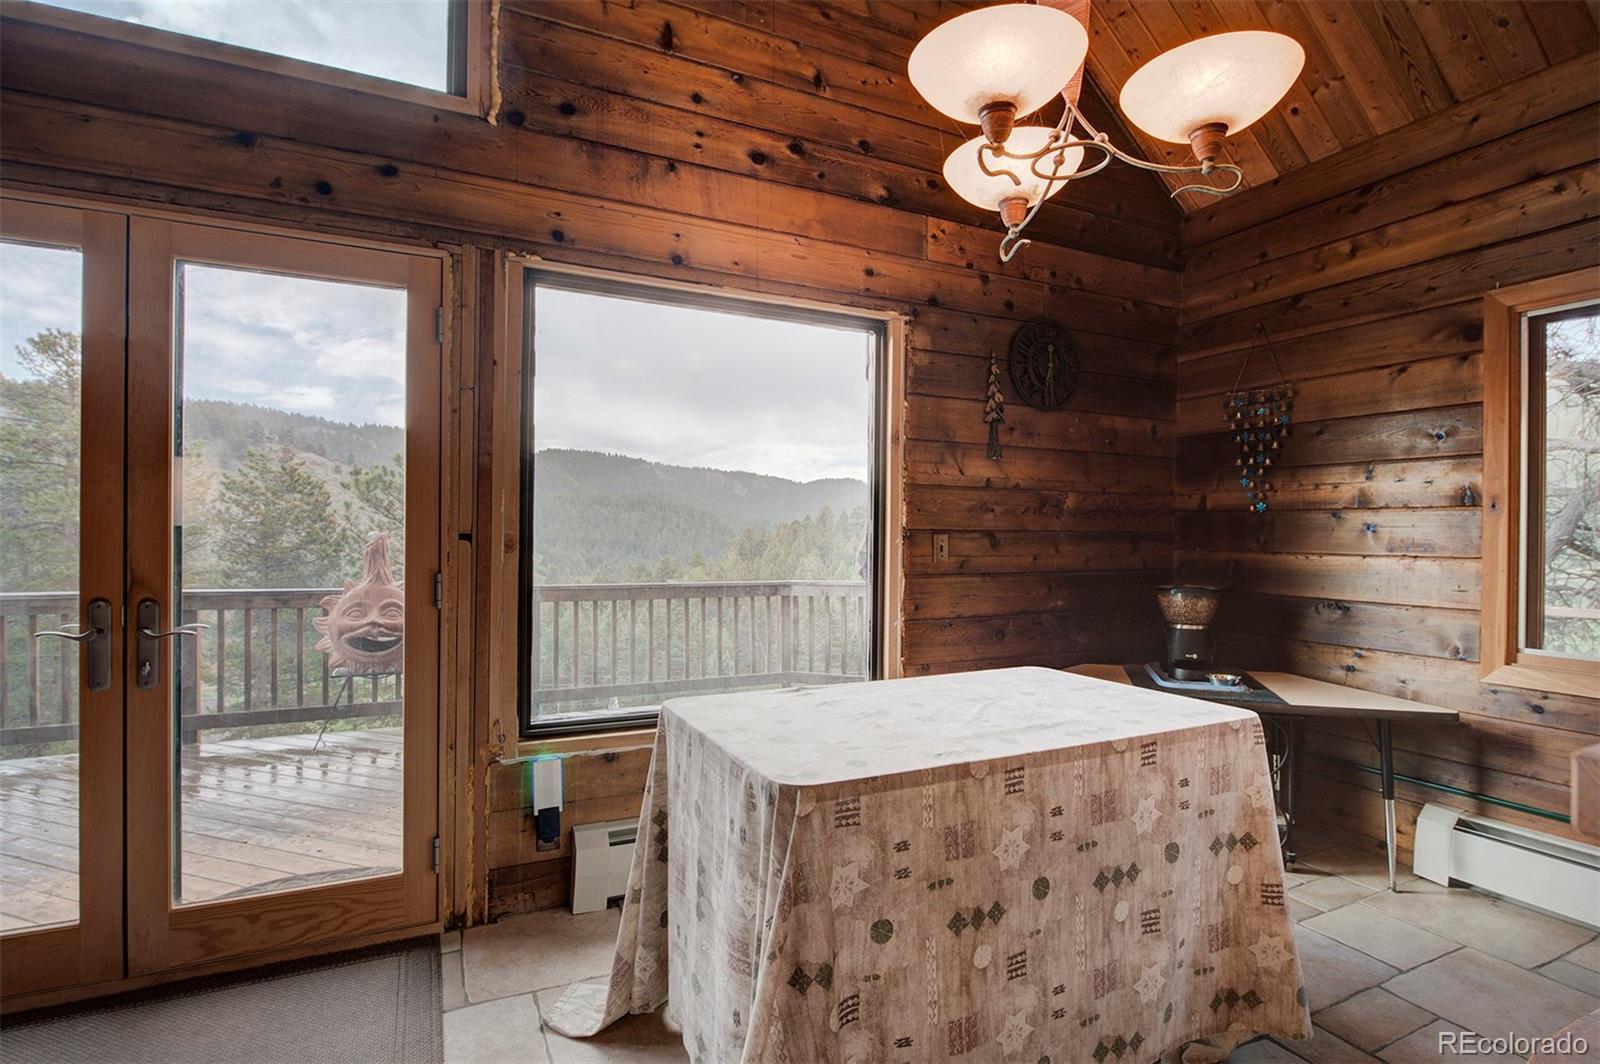 MLS# 6922377 - 14 - 12123 Geronimo Trail, Conifer, CO 80433